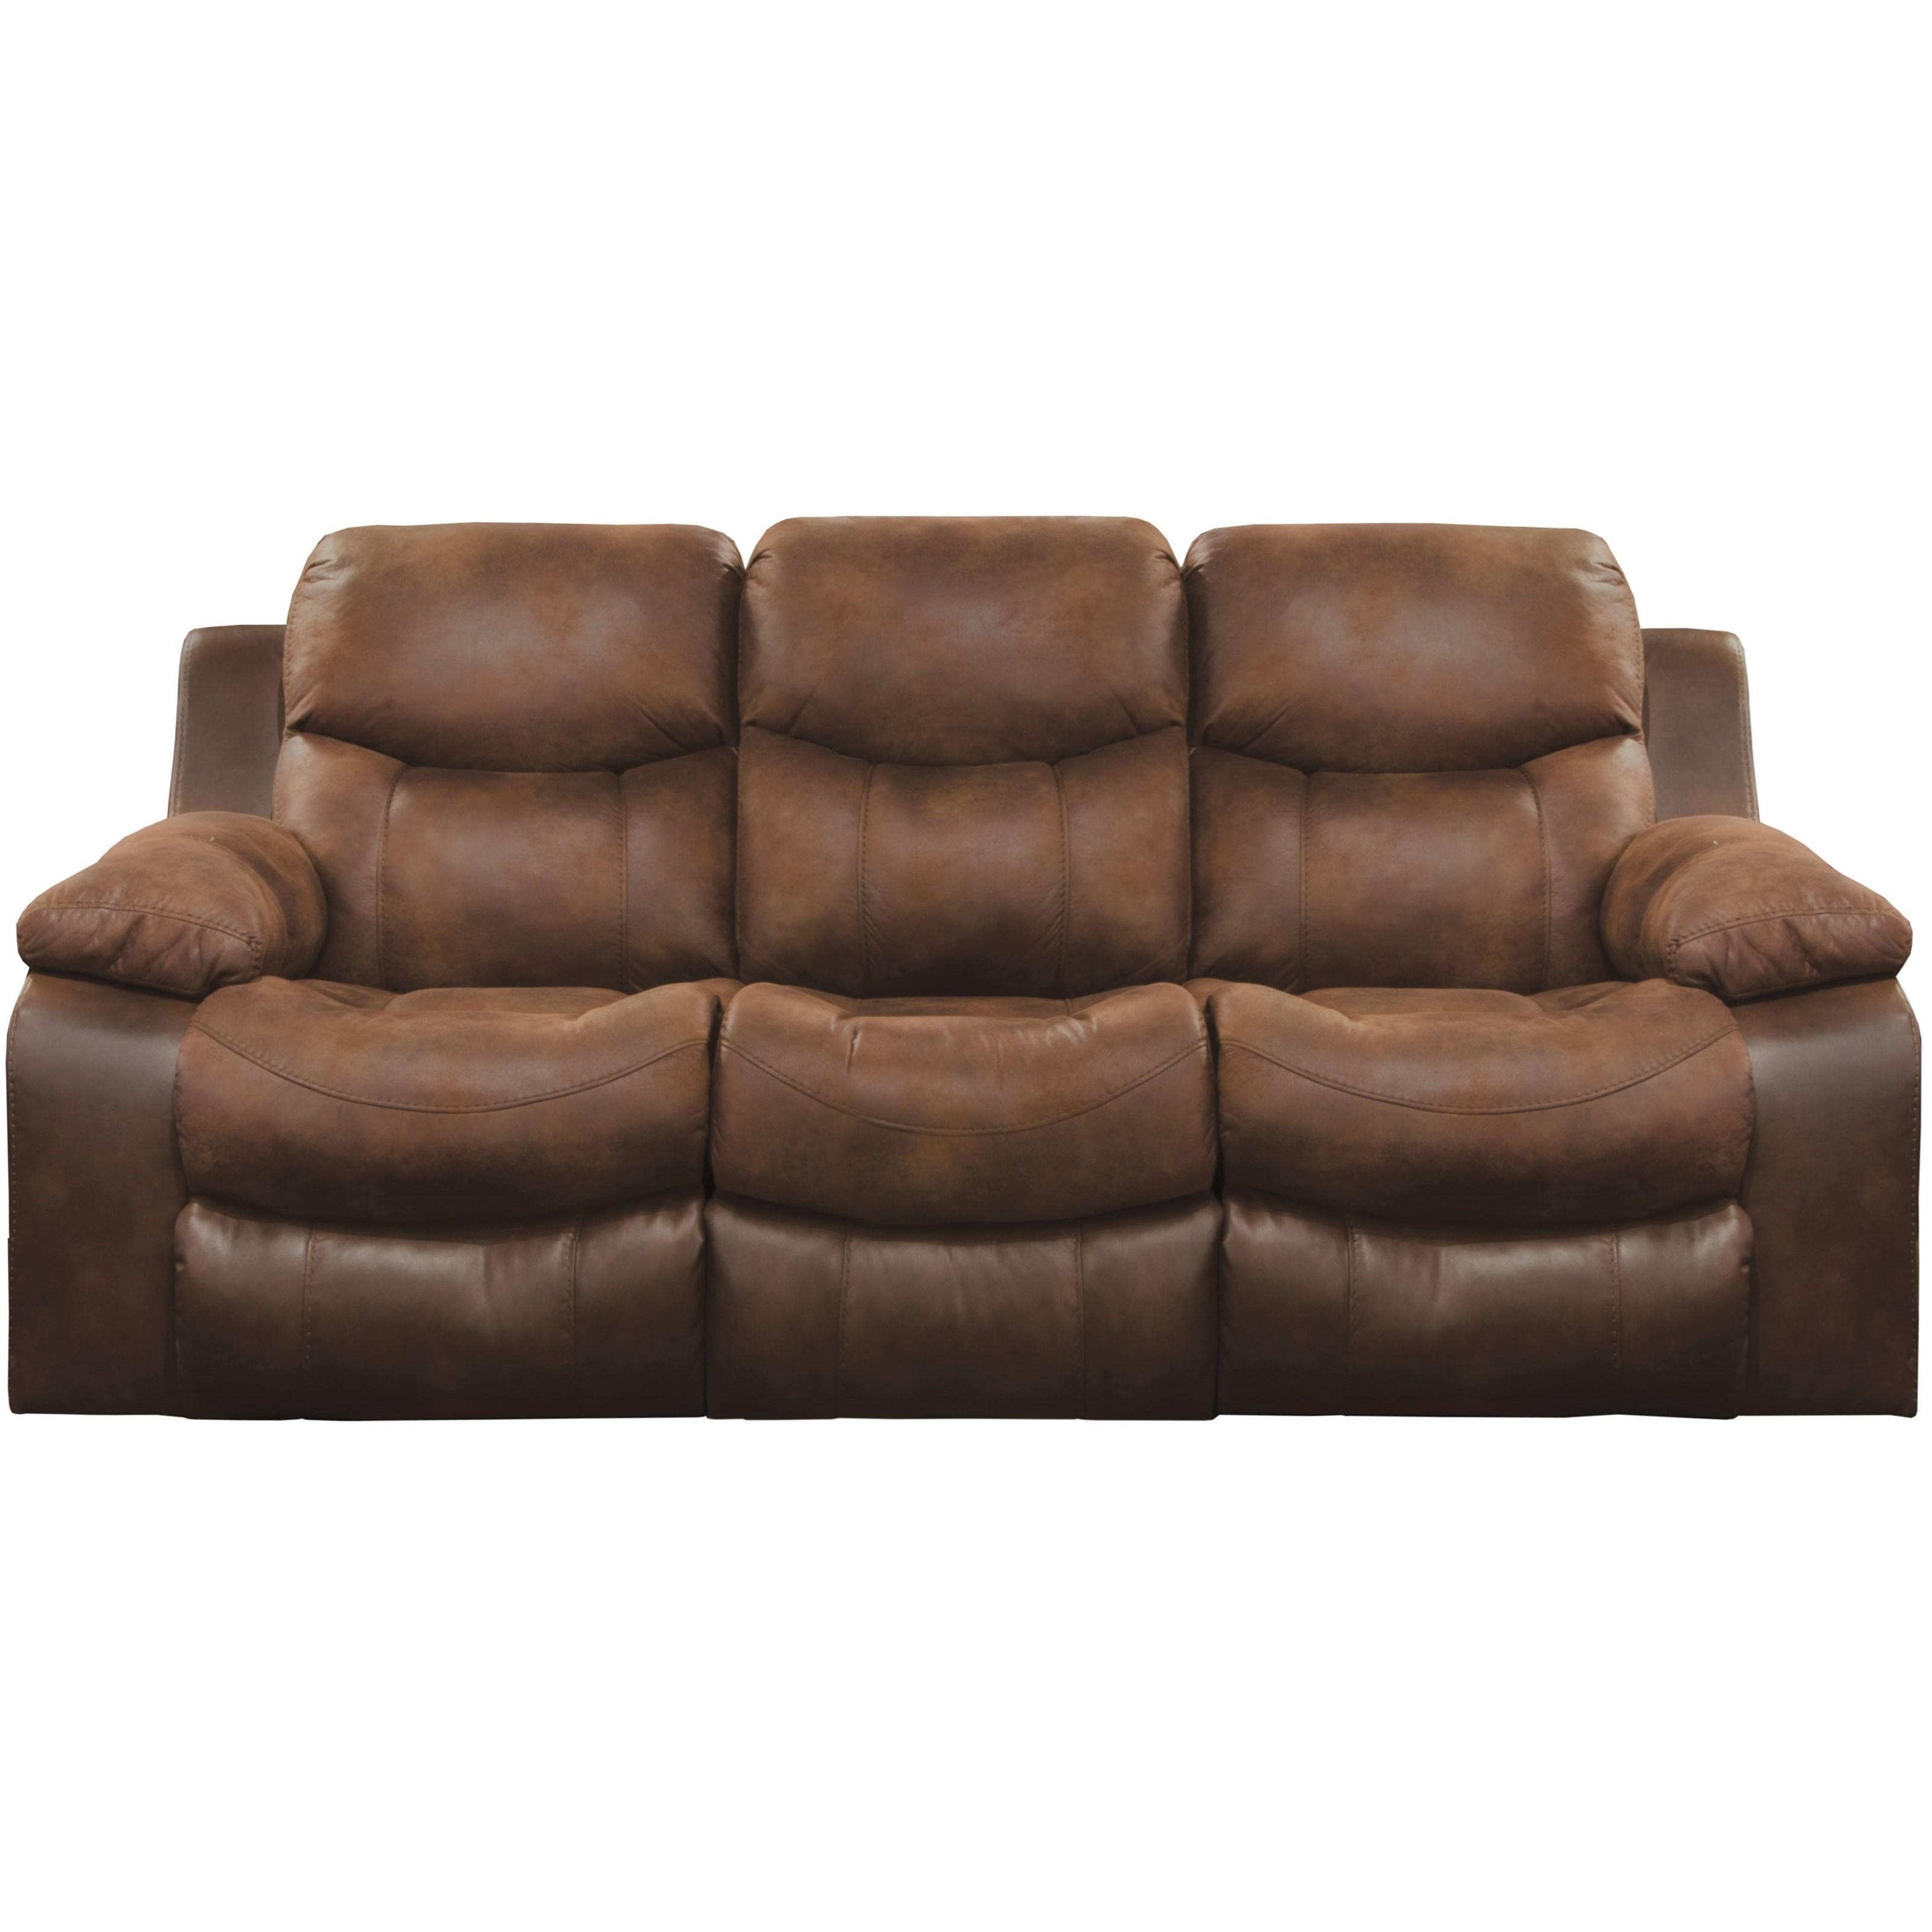 catnapper reclining sofas reviews nashville sofa harveys henderson power with drop down